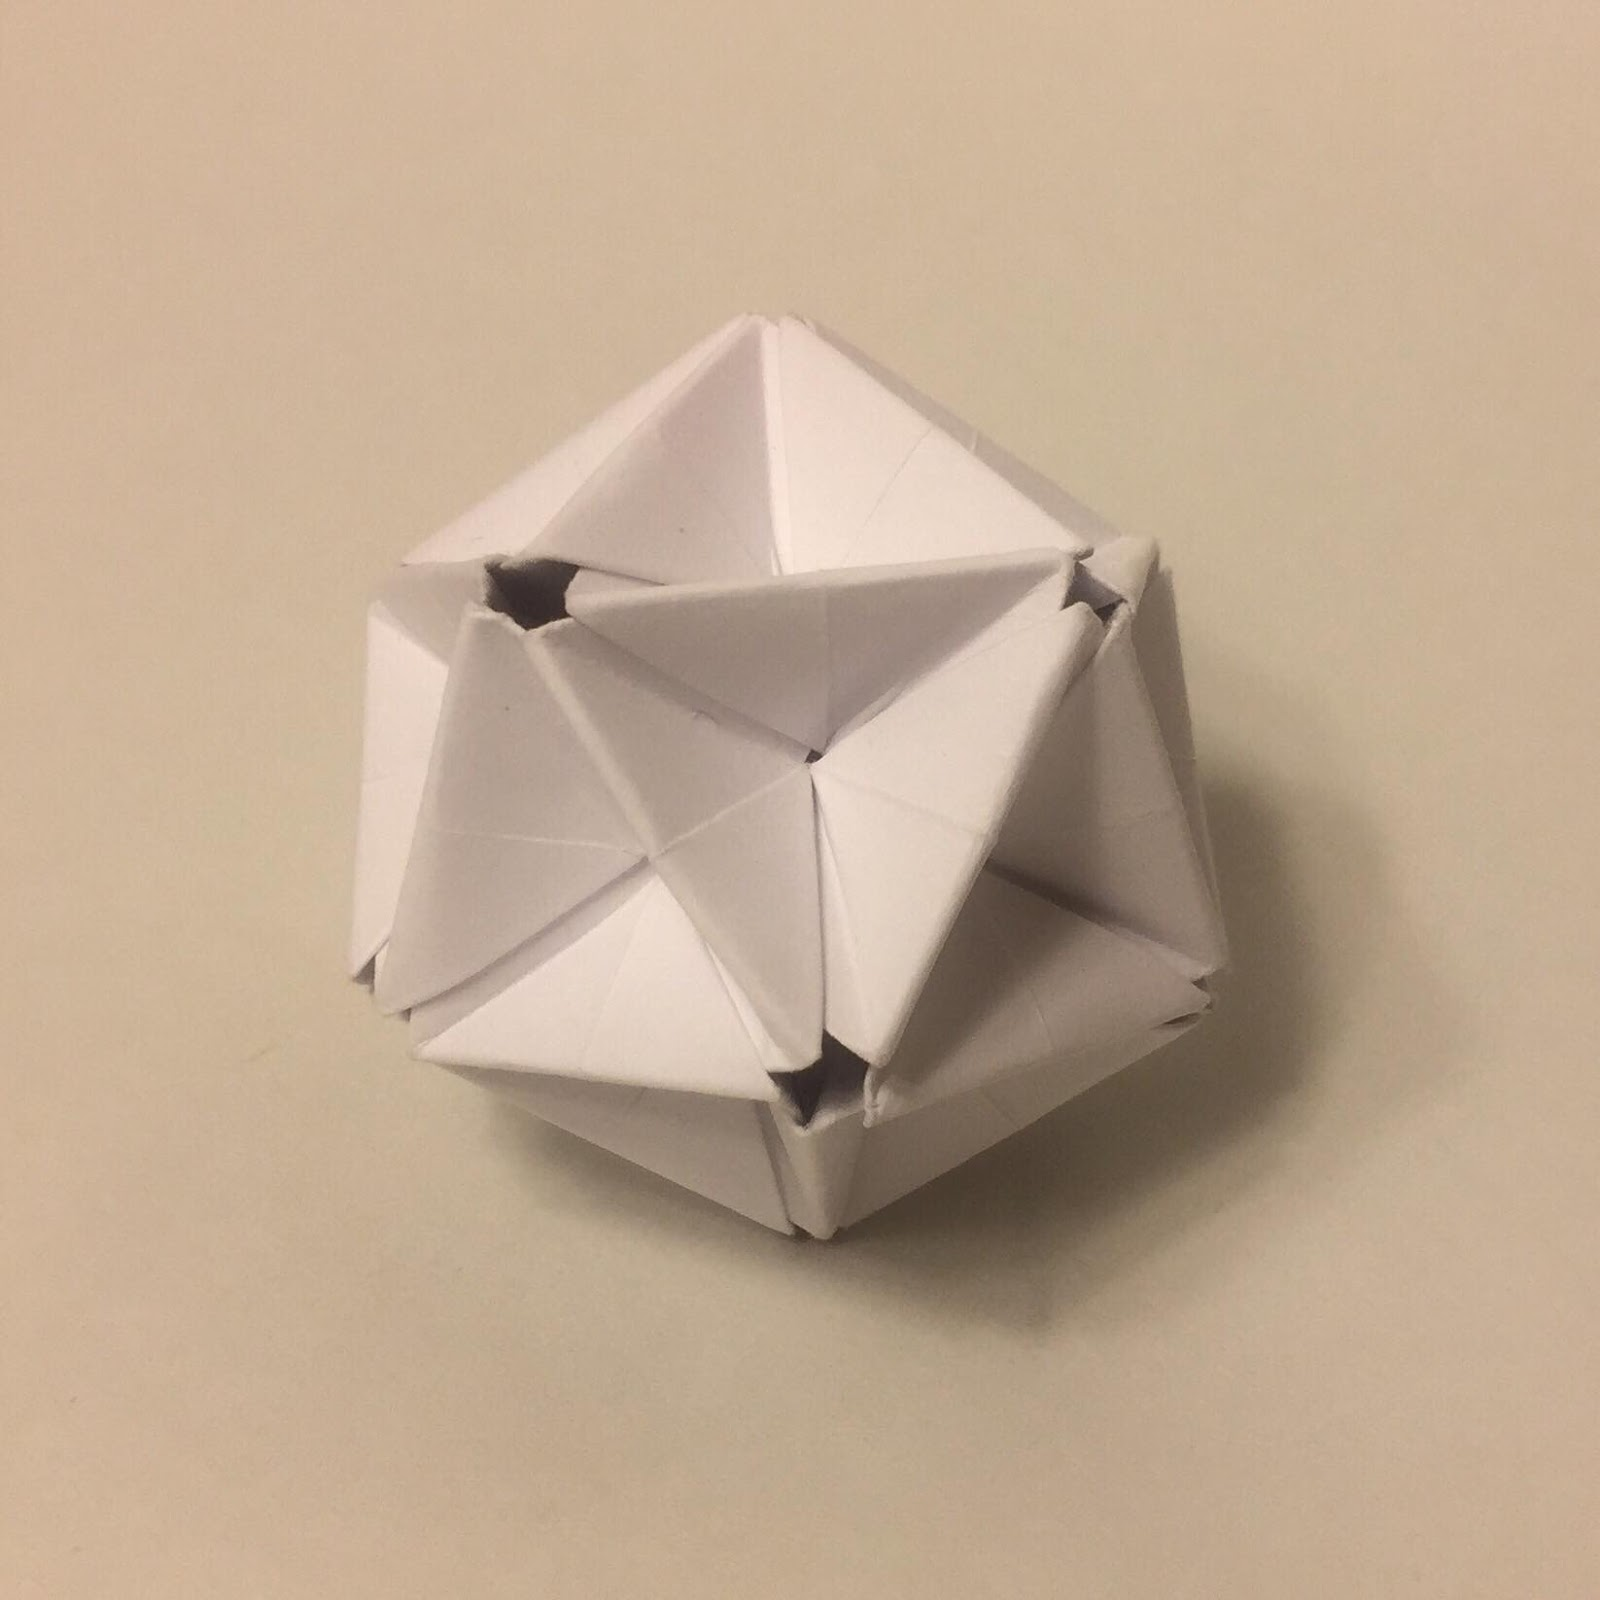 Modular Origami - balls and polyhedra folded by Michał Kosmulski | 1600x1600